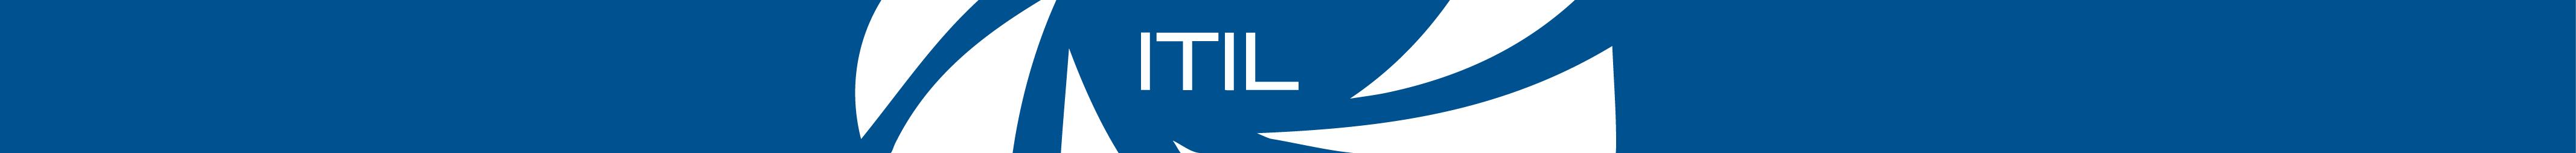 itil-02-02